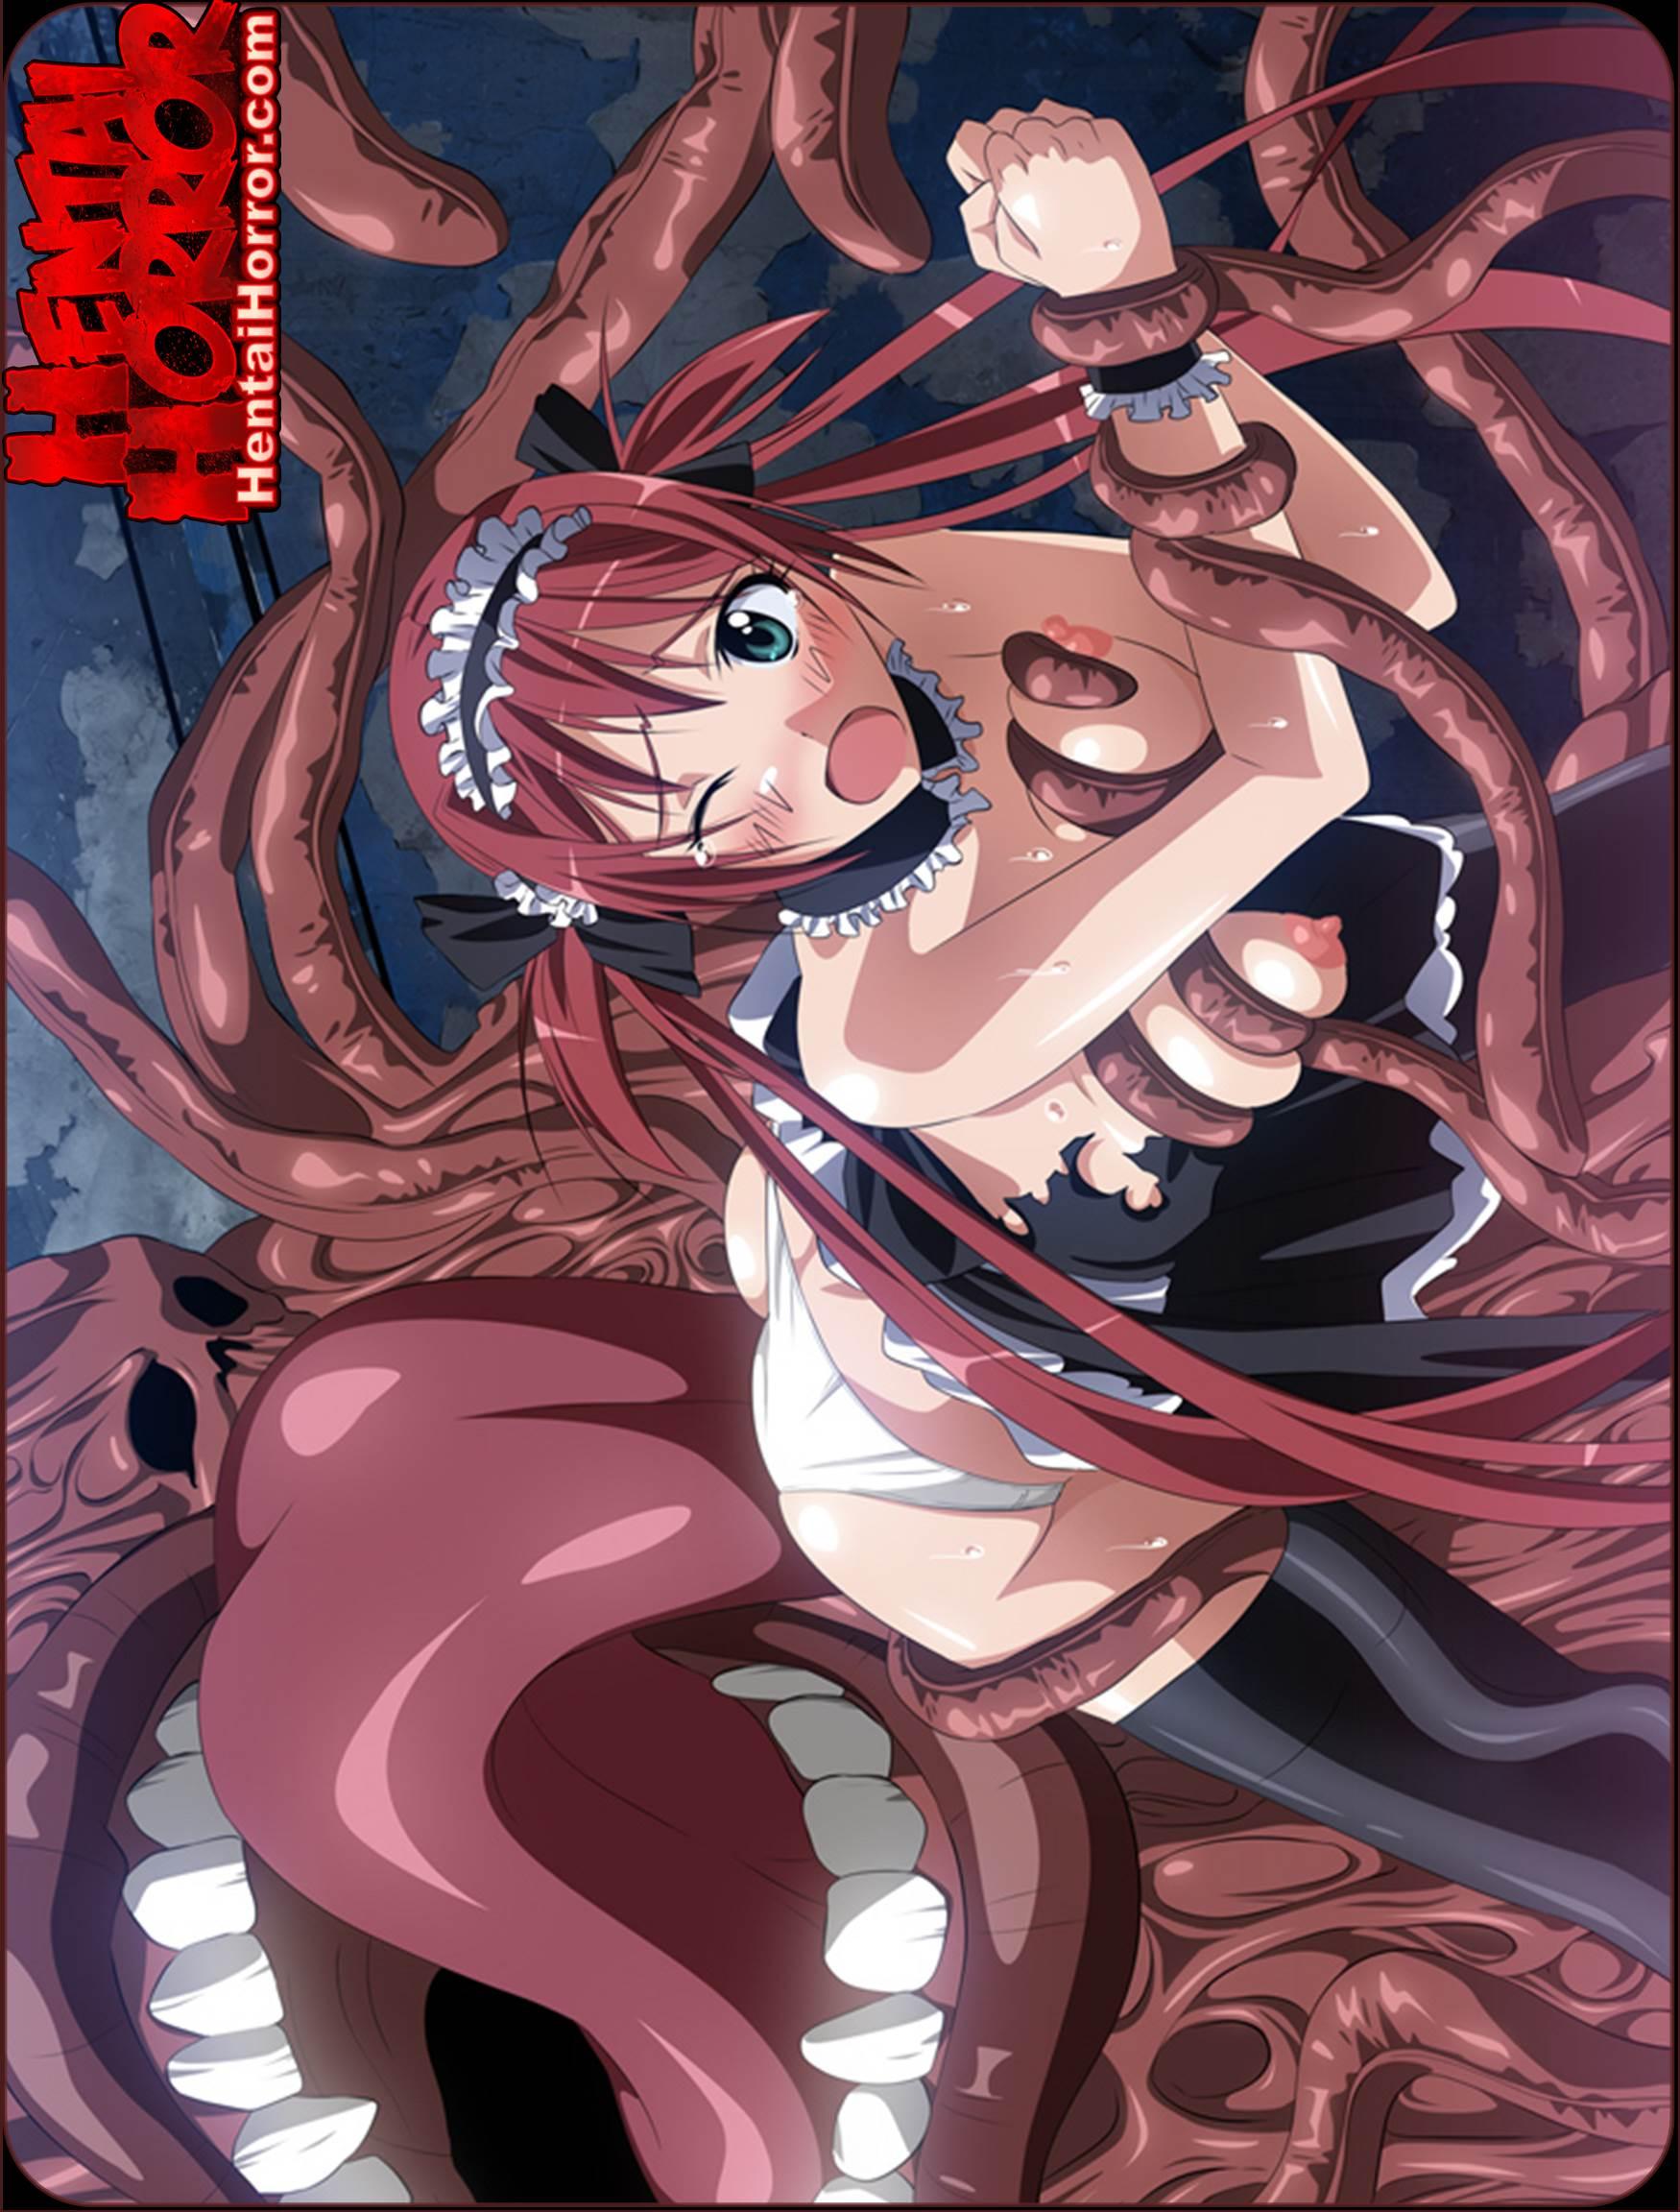 oppaihentailoli monstertentaclerape bigtitsporn loliconmaid tentacleshorror